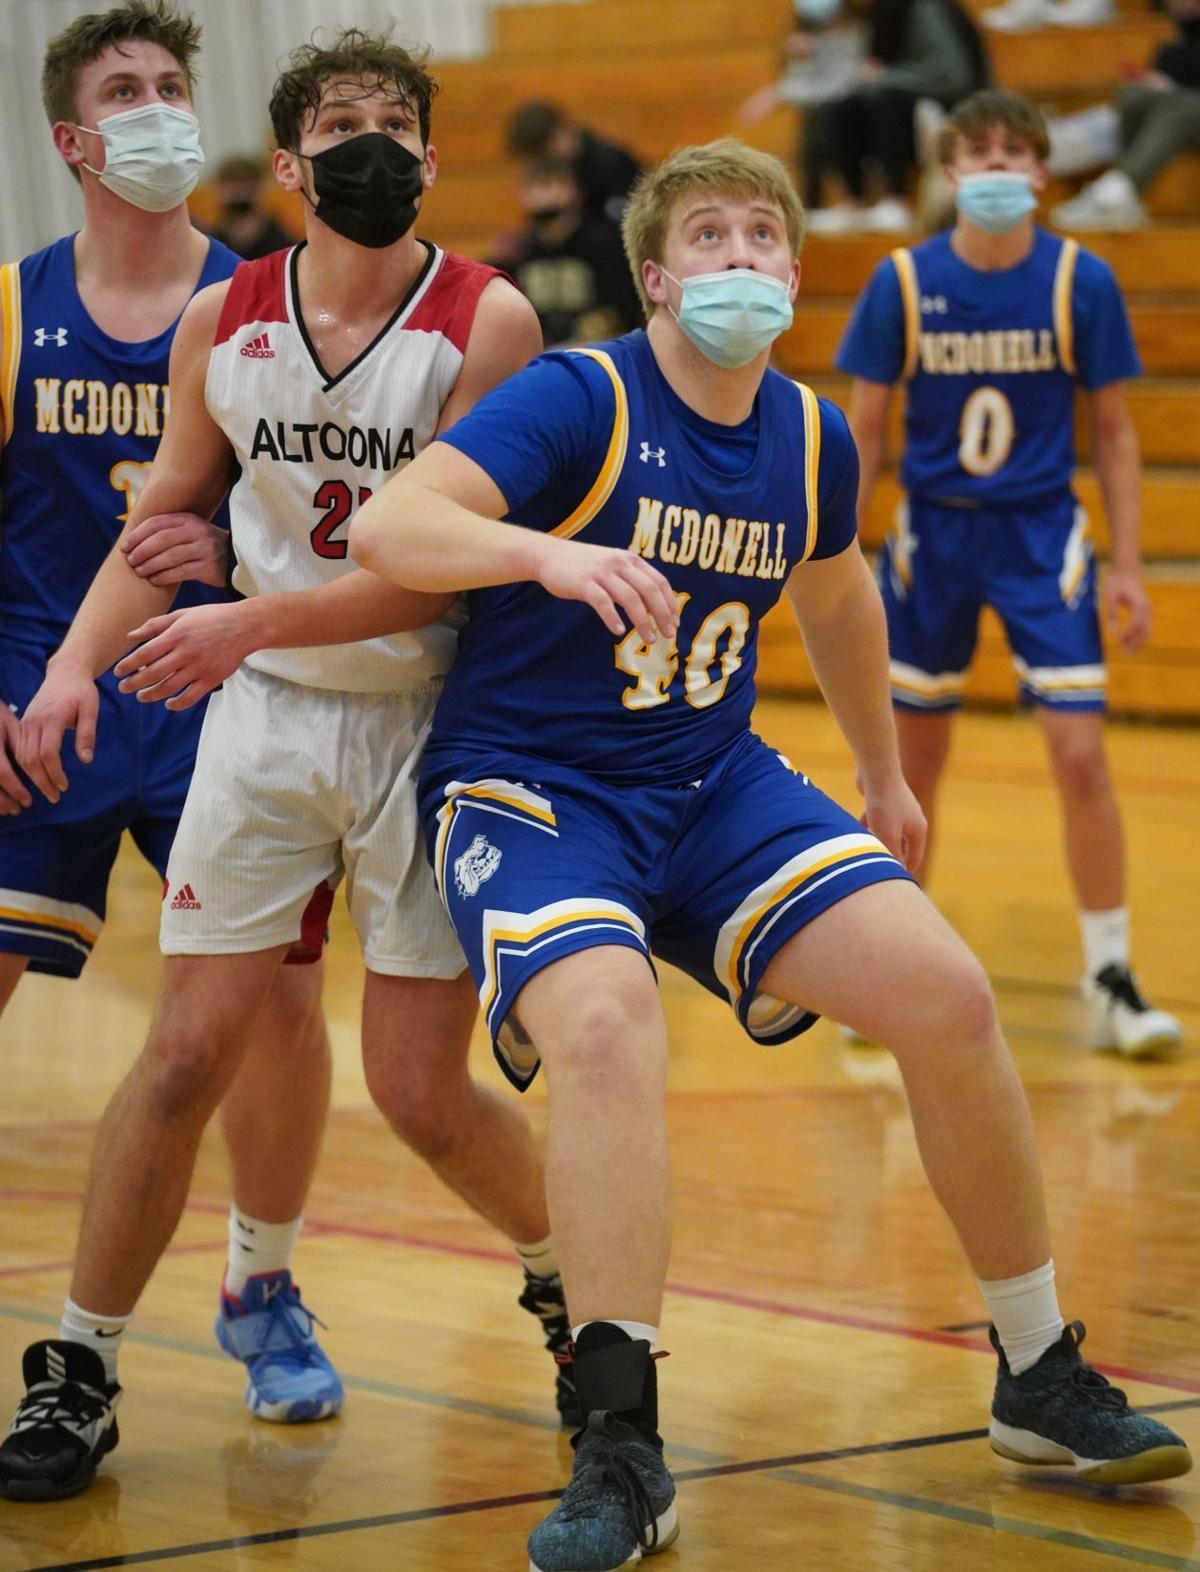 McDonell at Altoona boys basketball